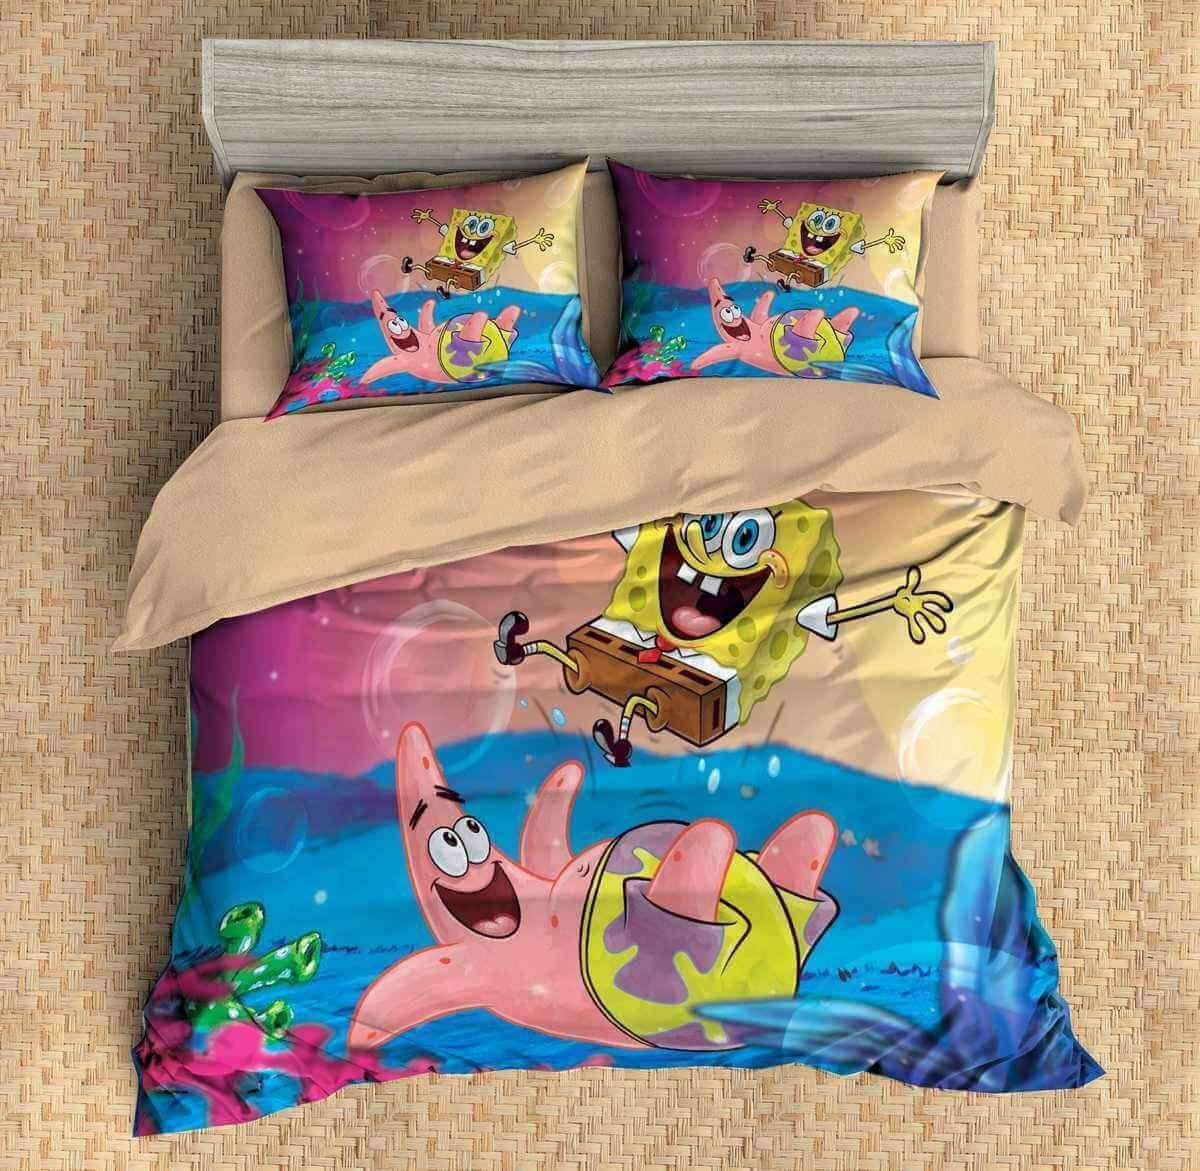 3d Customize Spongebob Squarepants Bedding Set Duvet Cover Set Bedroom Set Bedlinen 2 Duvet Bedding Sets Bedding Sets Customised Bed Spongebob bedroom set images